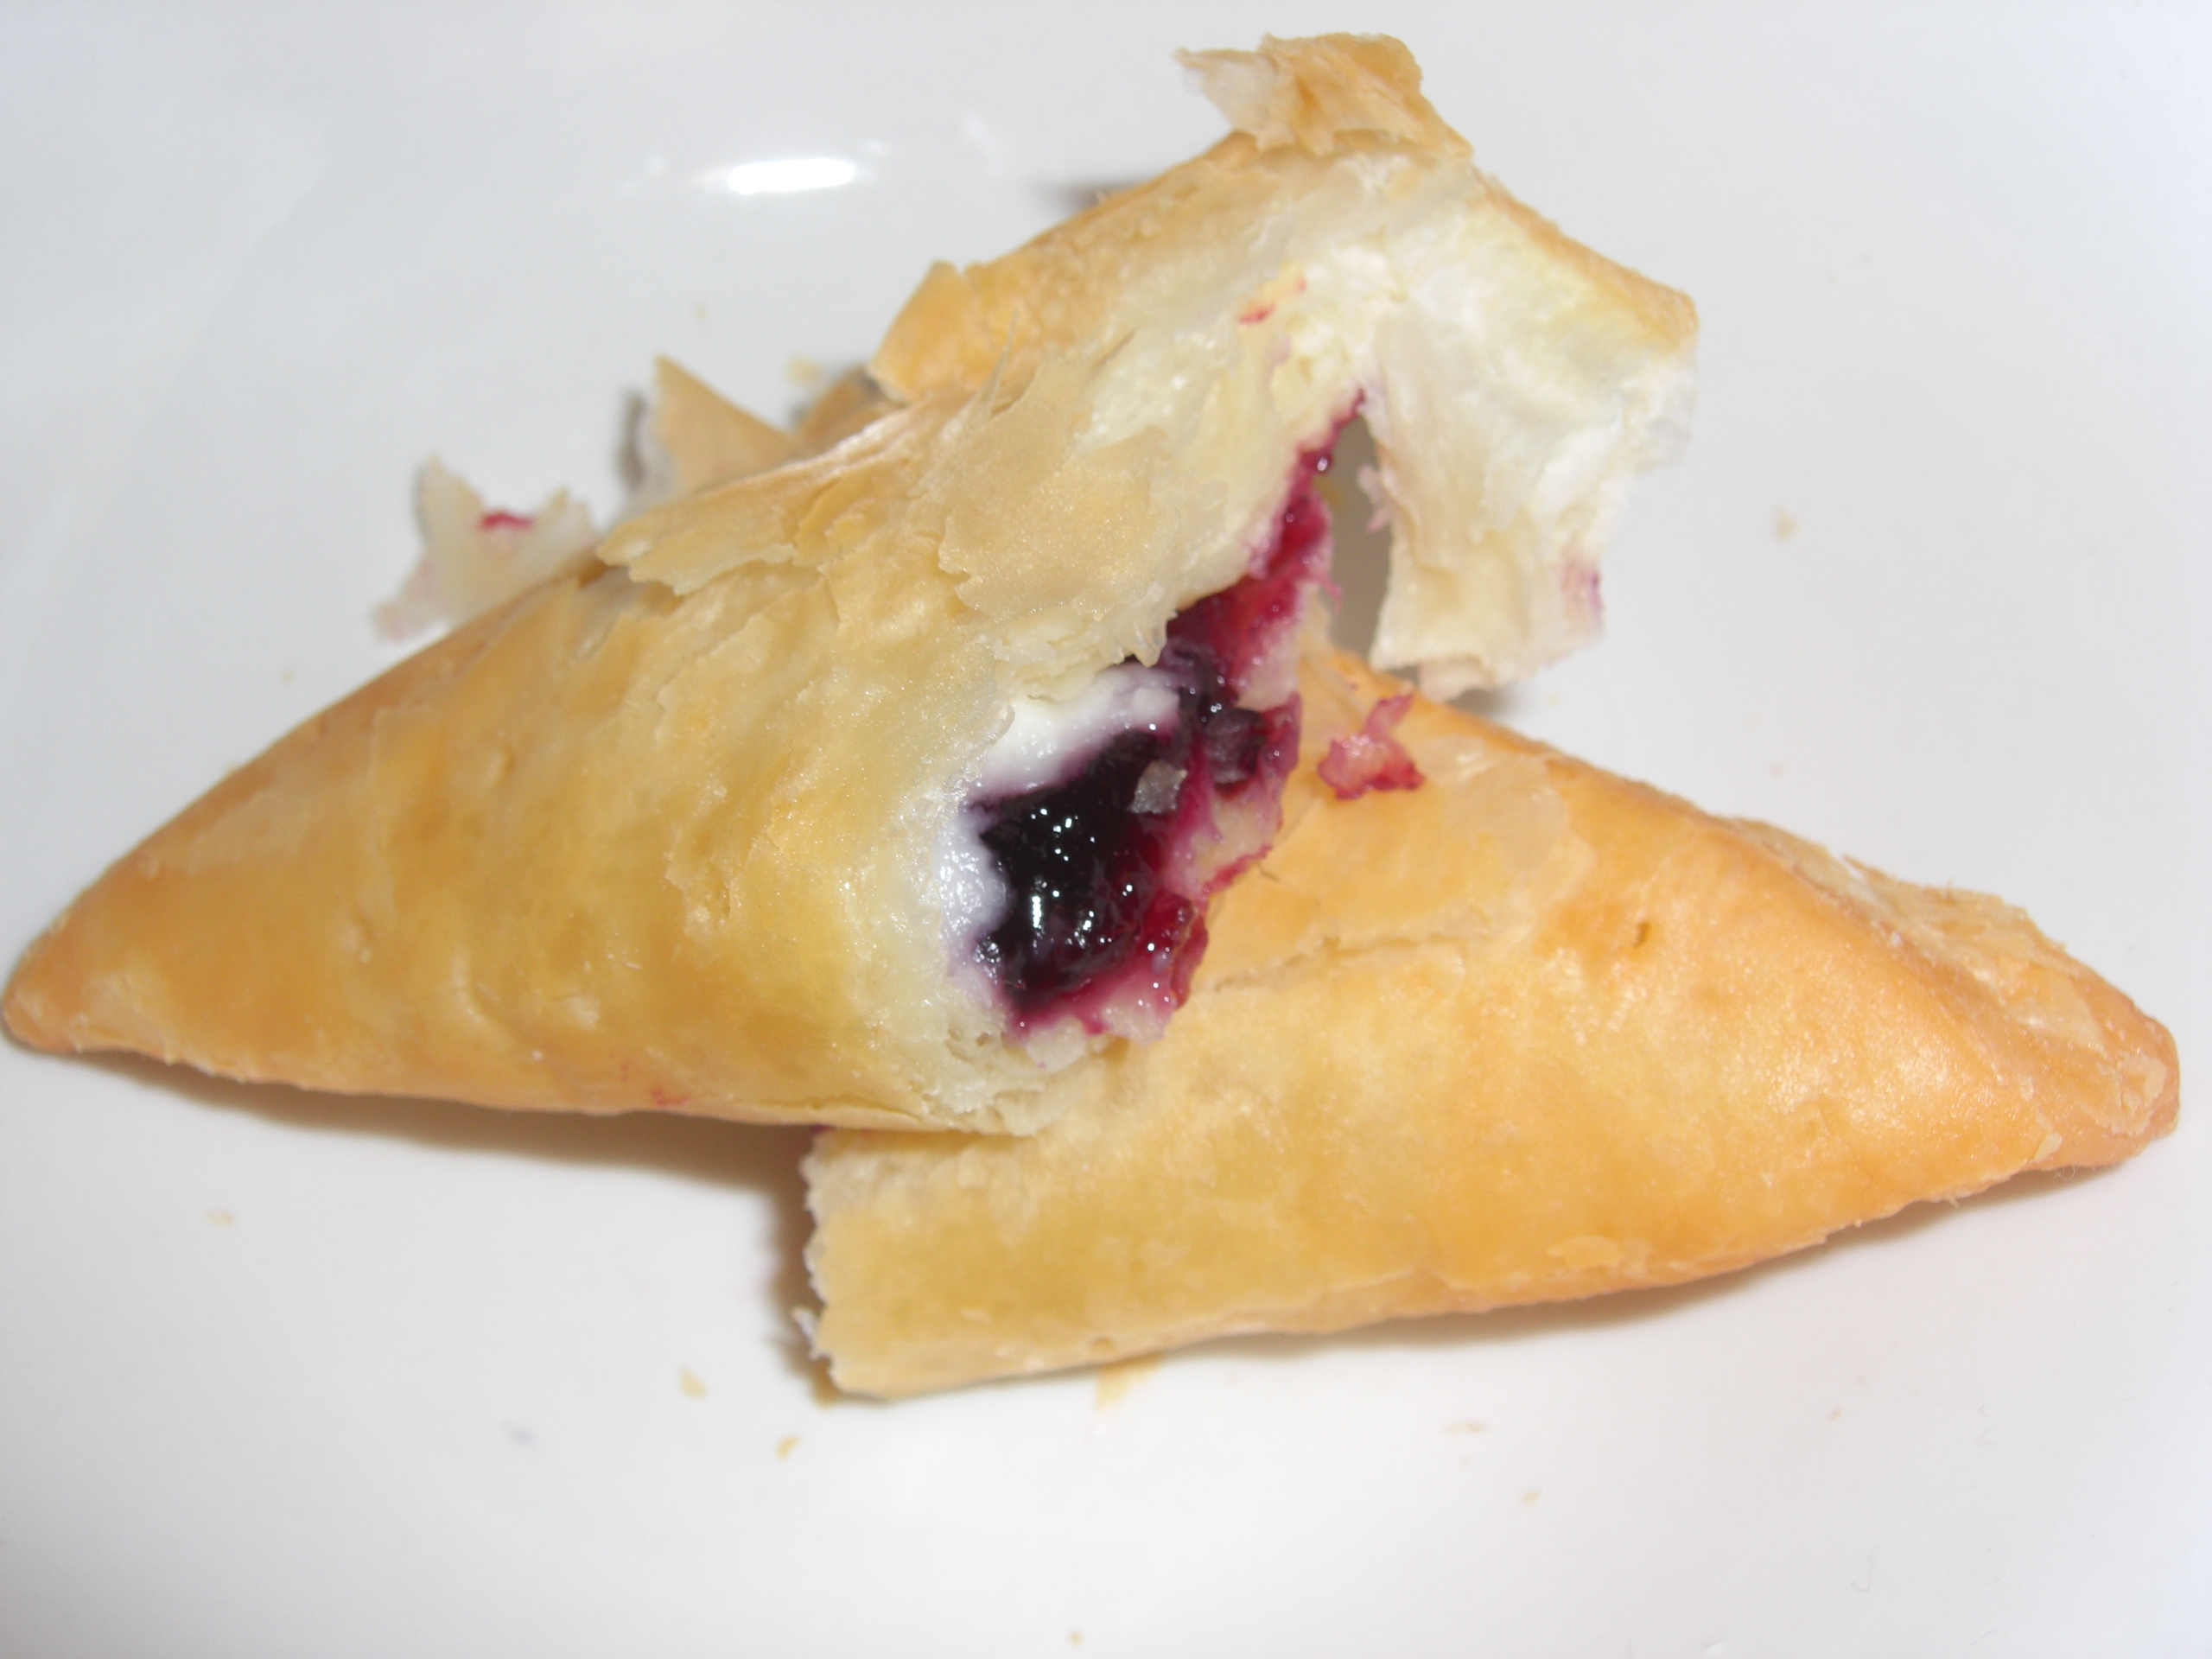 File:Blueberry cream cheese pie mcj2012.jpg - Wikimedia Commons